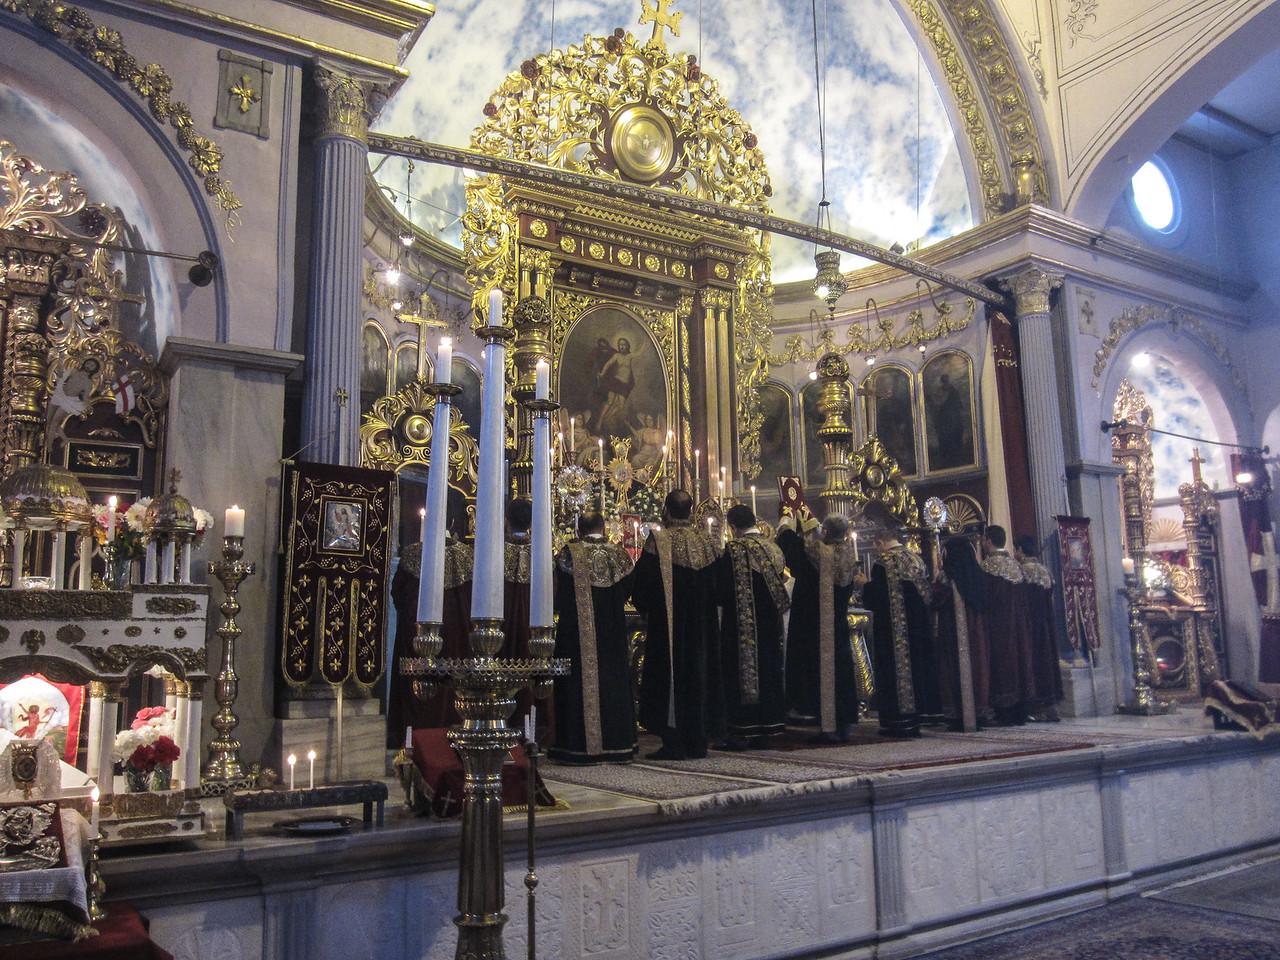 Easter Service at Armenian Patriarchal Church (Kumkapı, 2013)